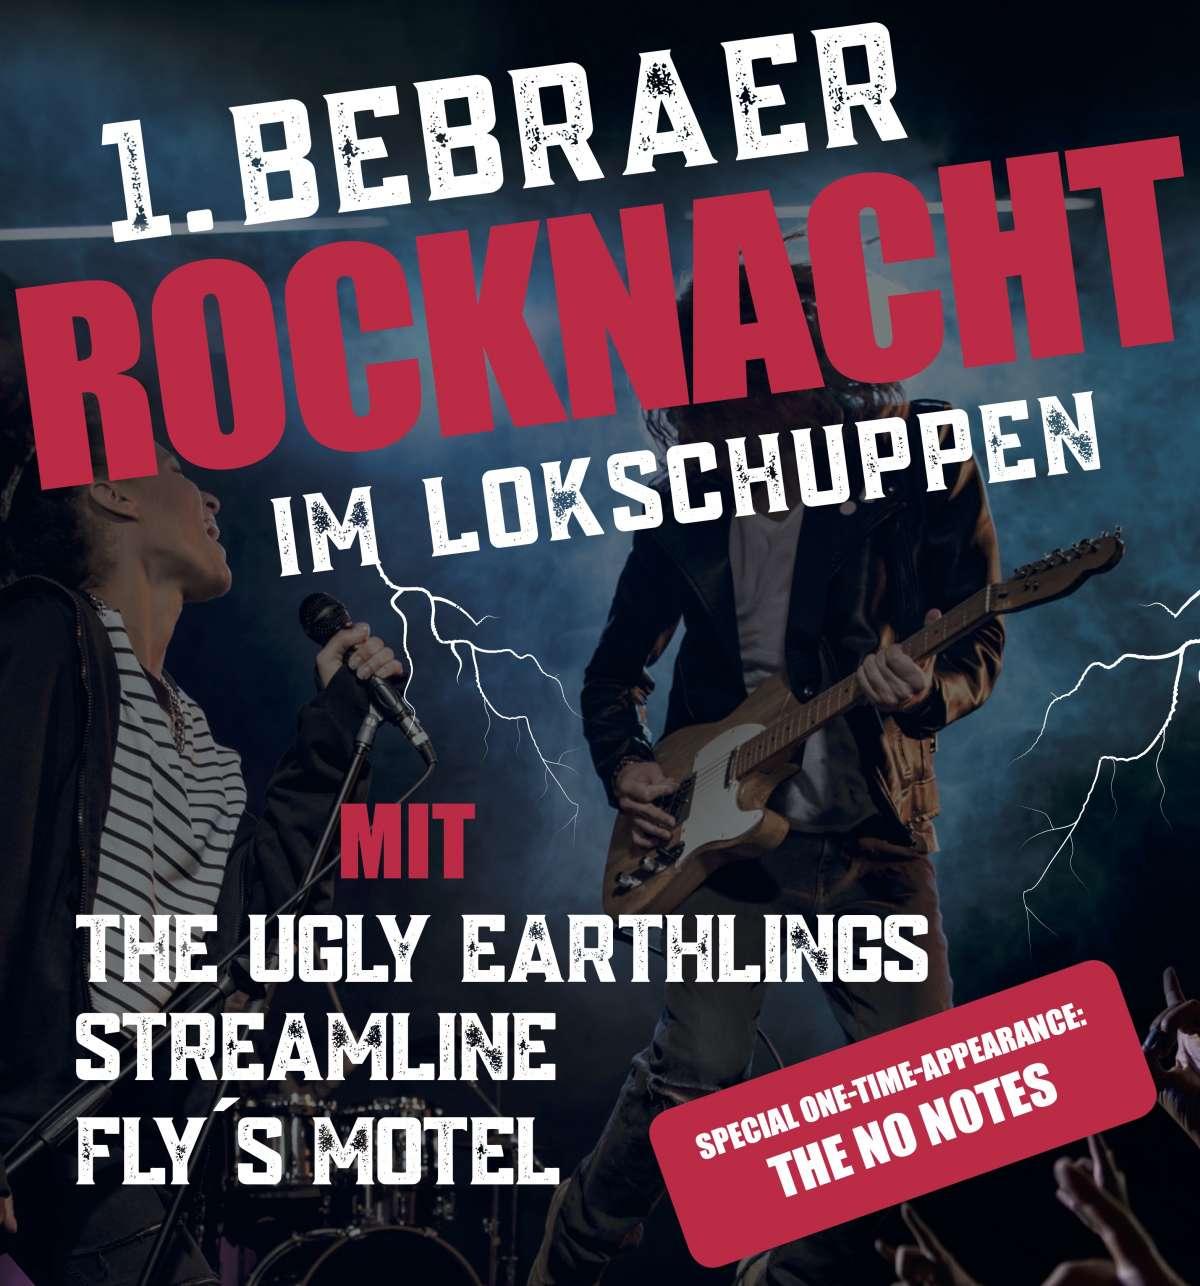 1. Bebraer Rocknacht